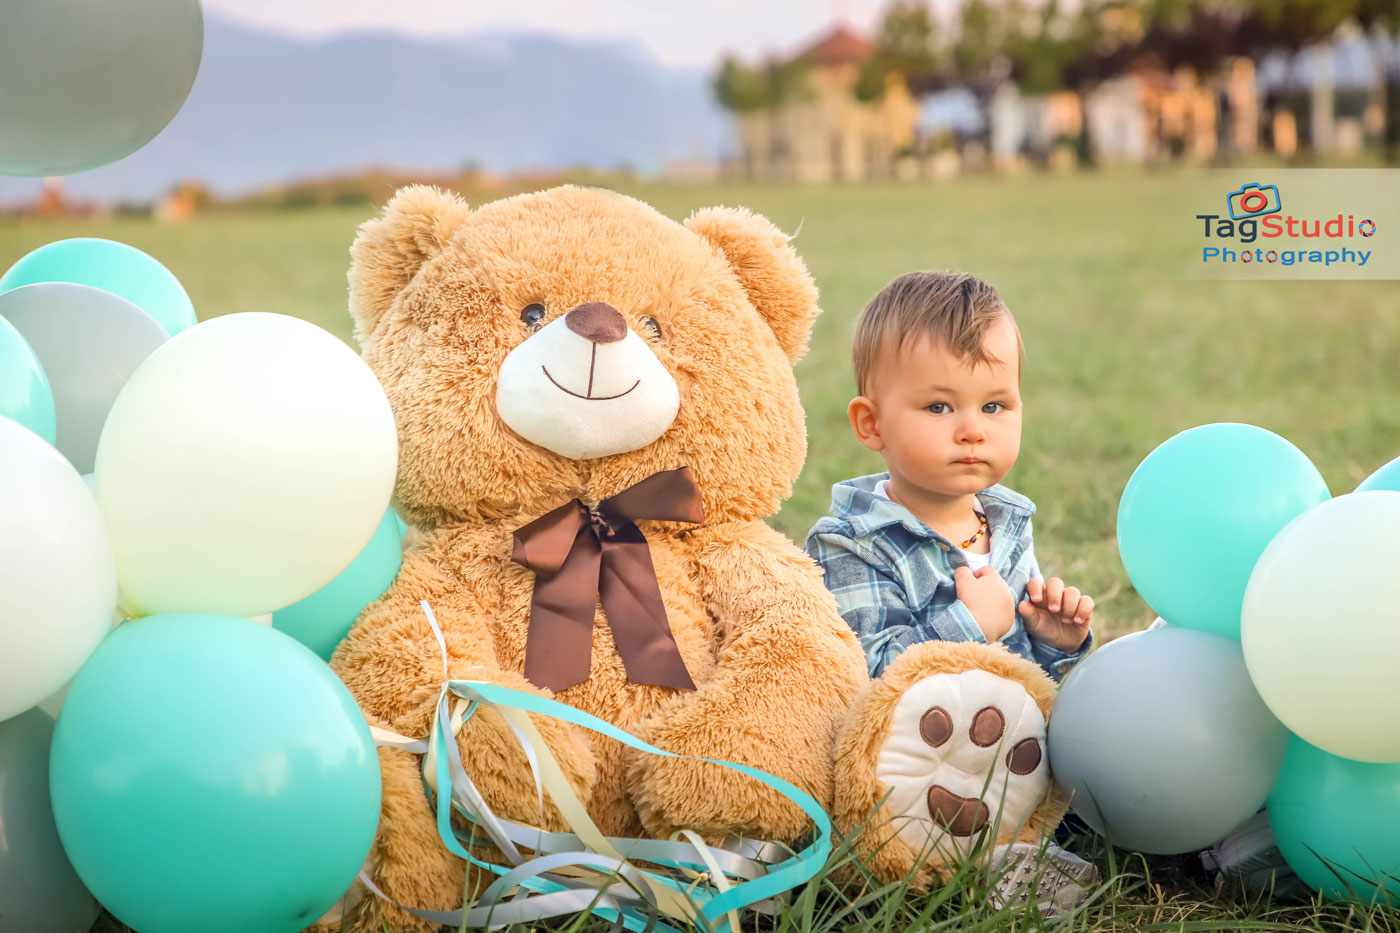 fotosuting deteta za prvi rodjendan